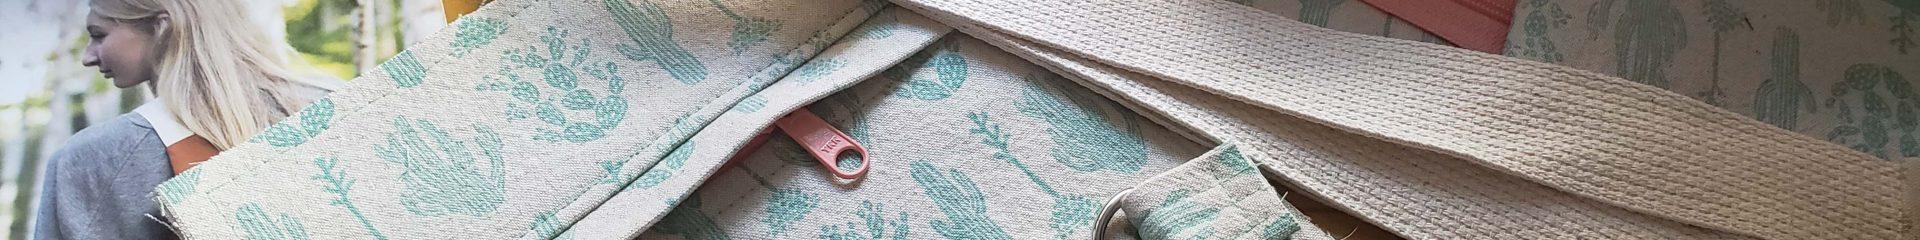 Mint Cactus Sandhill Sling